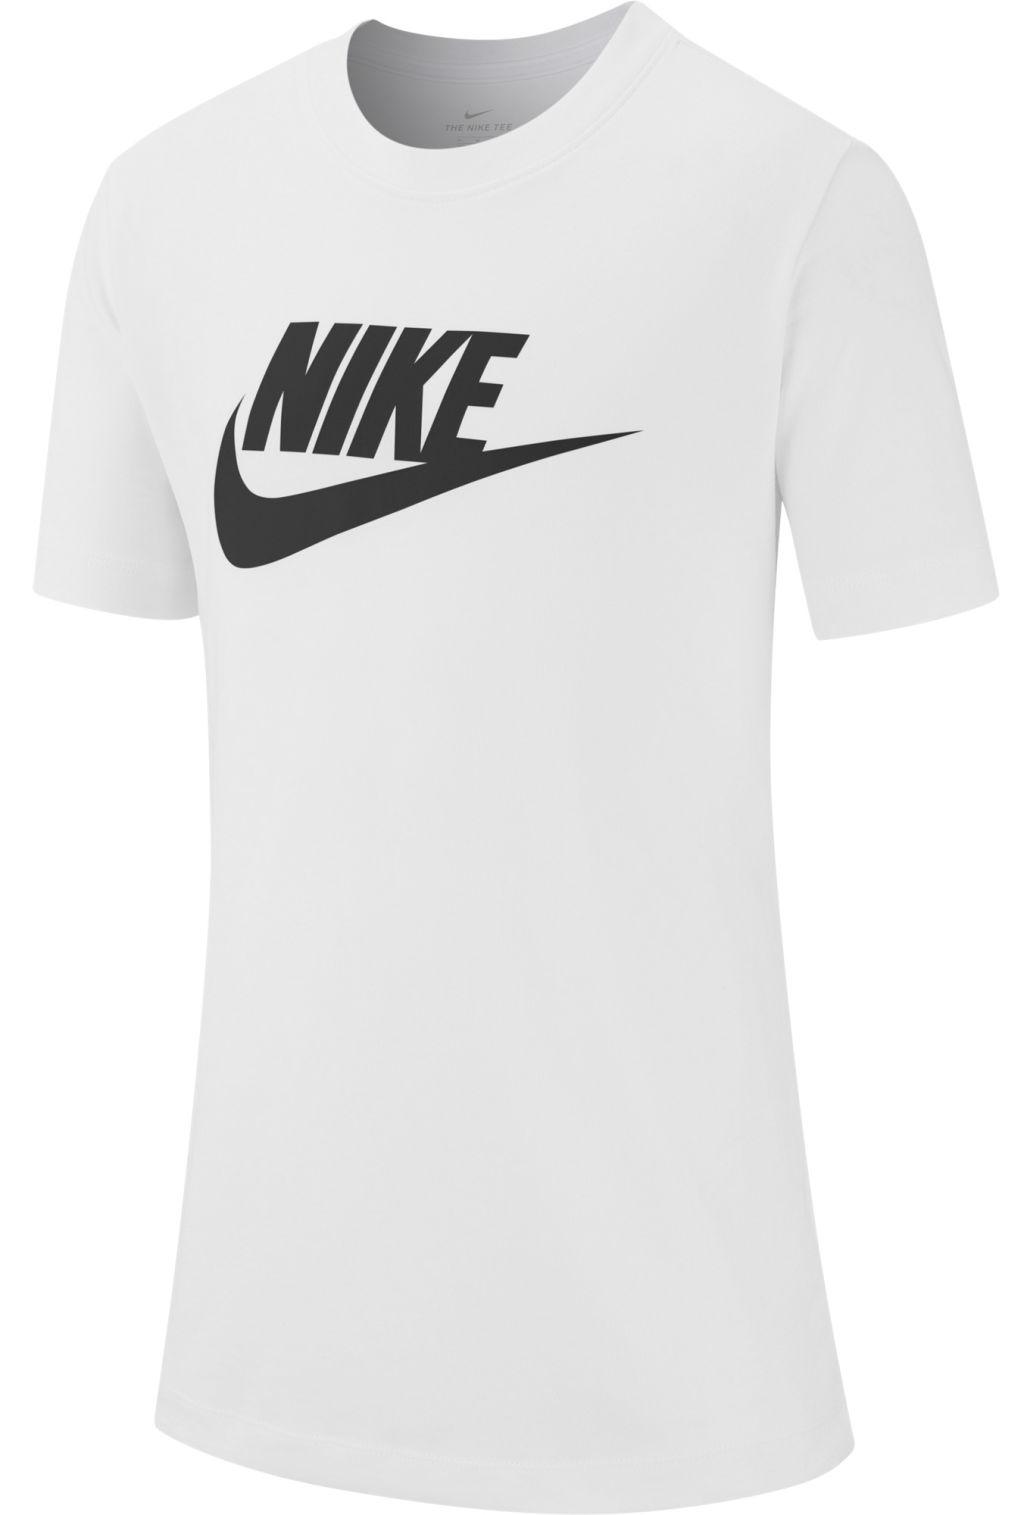 huge discount c9608 0c6ad Nike Nsw Futura Icon poikien t-paita Valkoinen